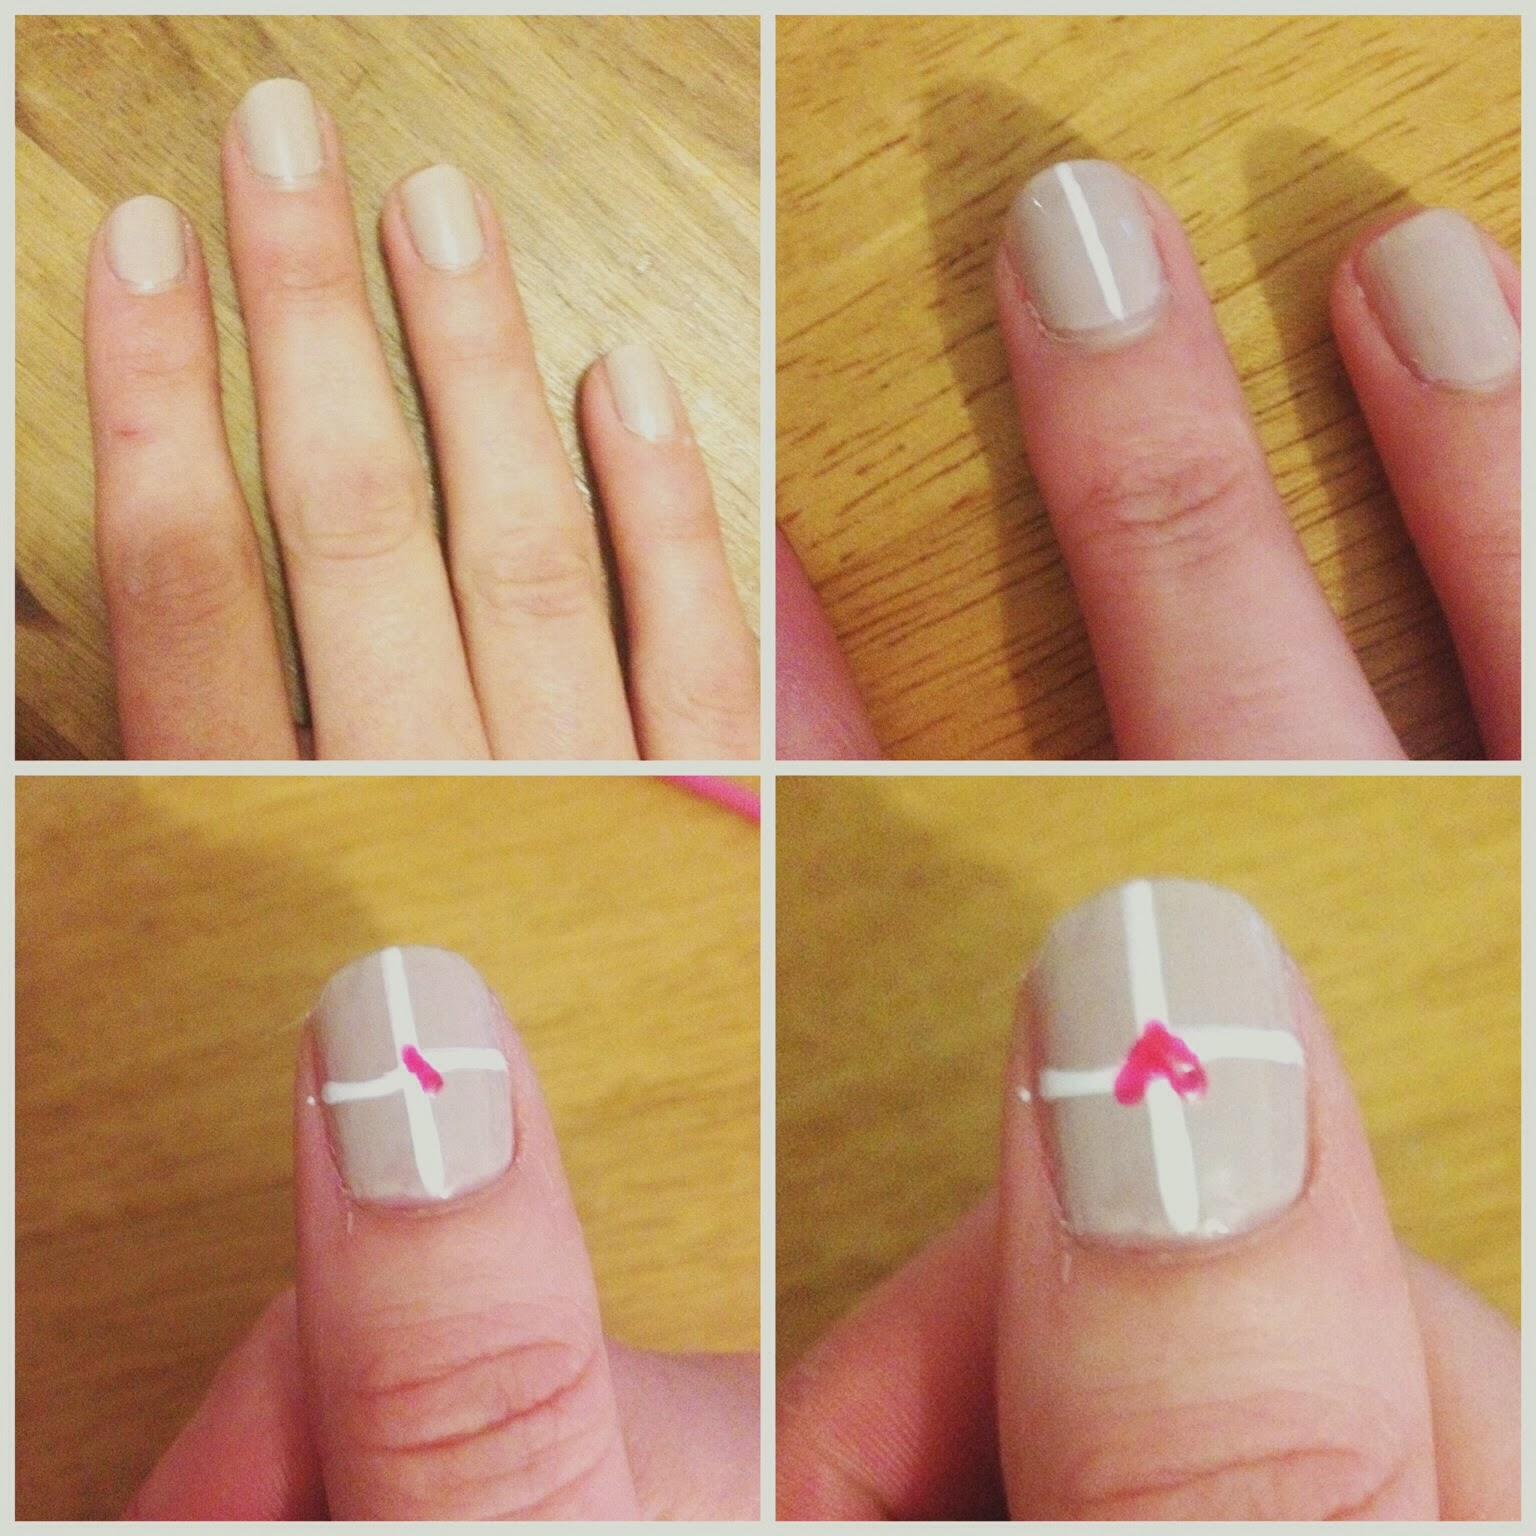 Hannahnhearts: Simple nail art tutorial: leopard and heart parcels